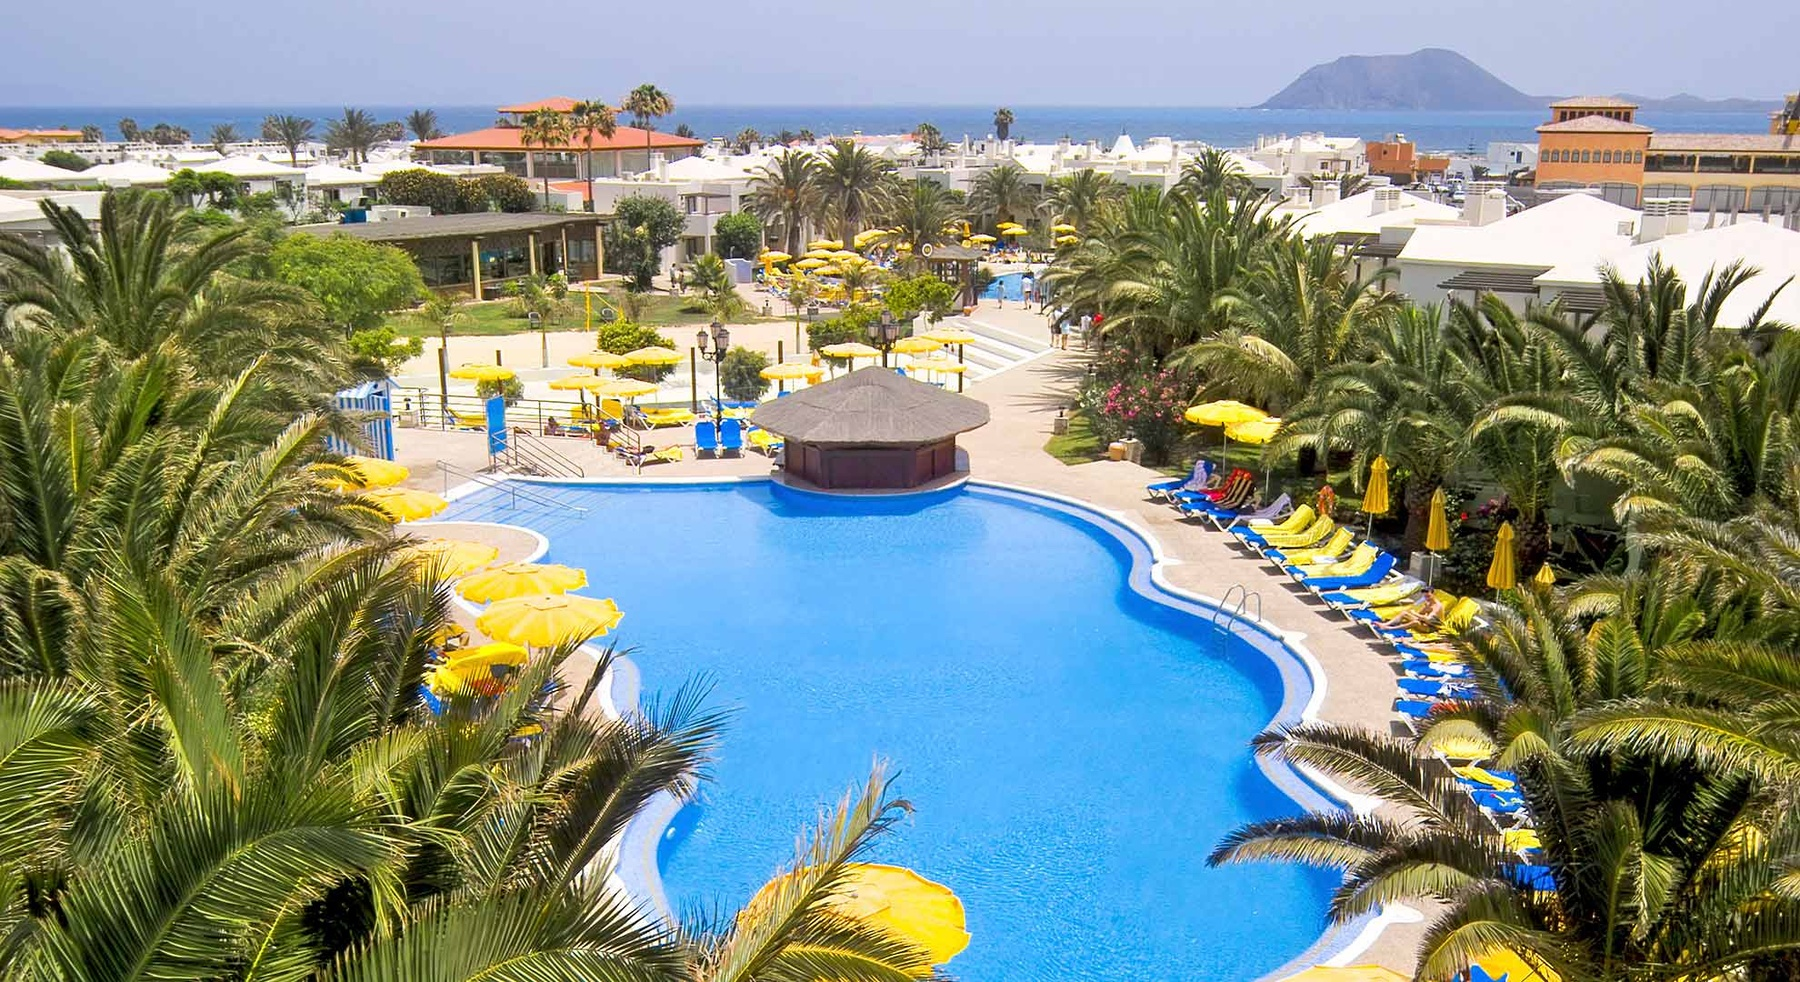 Piscinas Suite Hotel Atlantis Fuerteventura Resort - Piscina de actividades